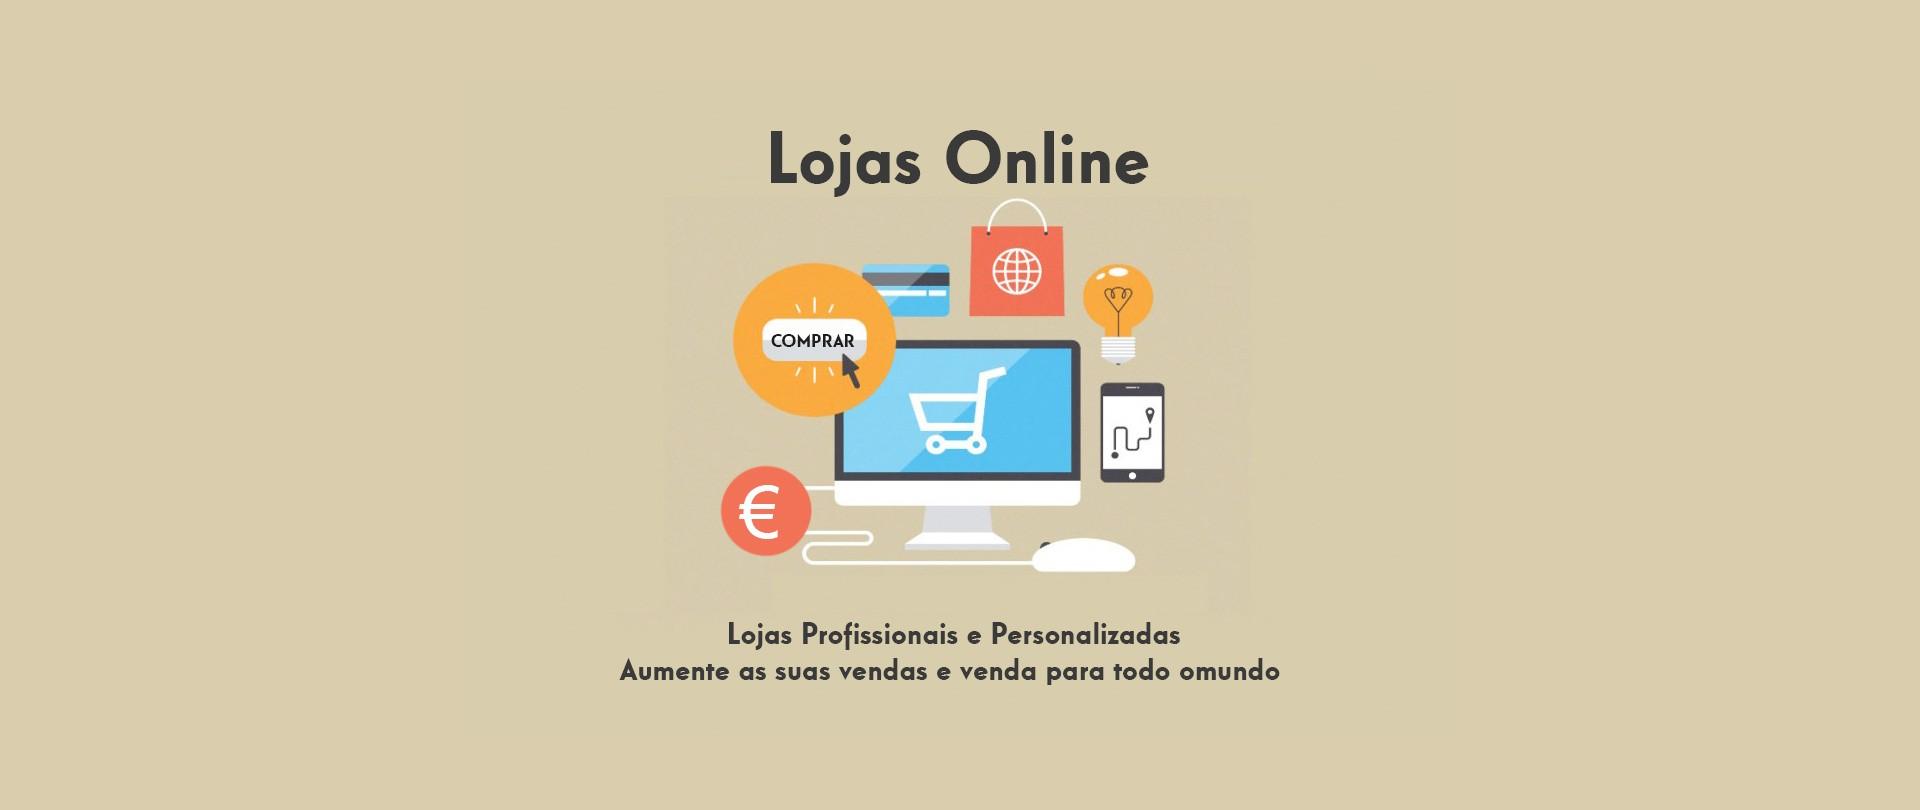 Foto: Lojas online portuguesas vendem 4,6 mil milhões em 2018